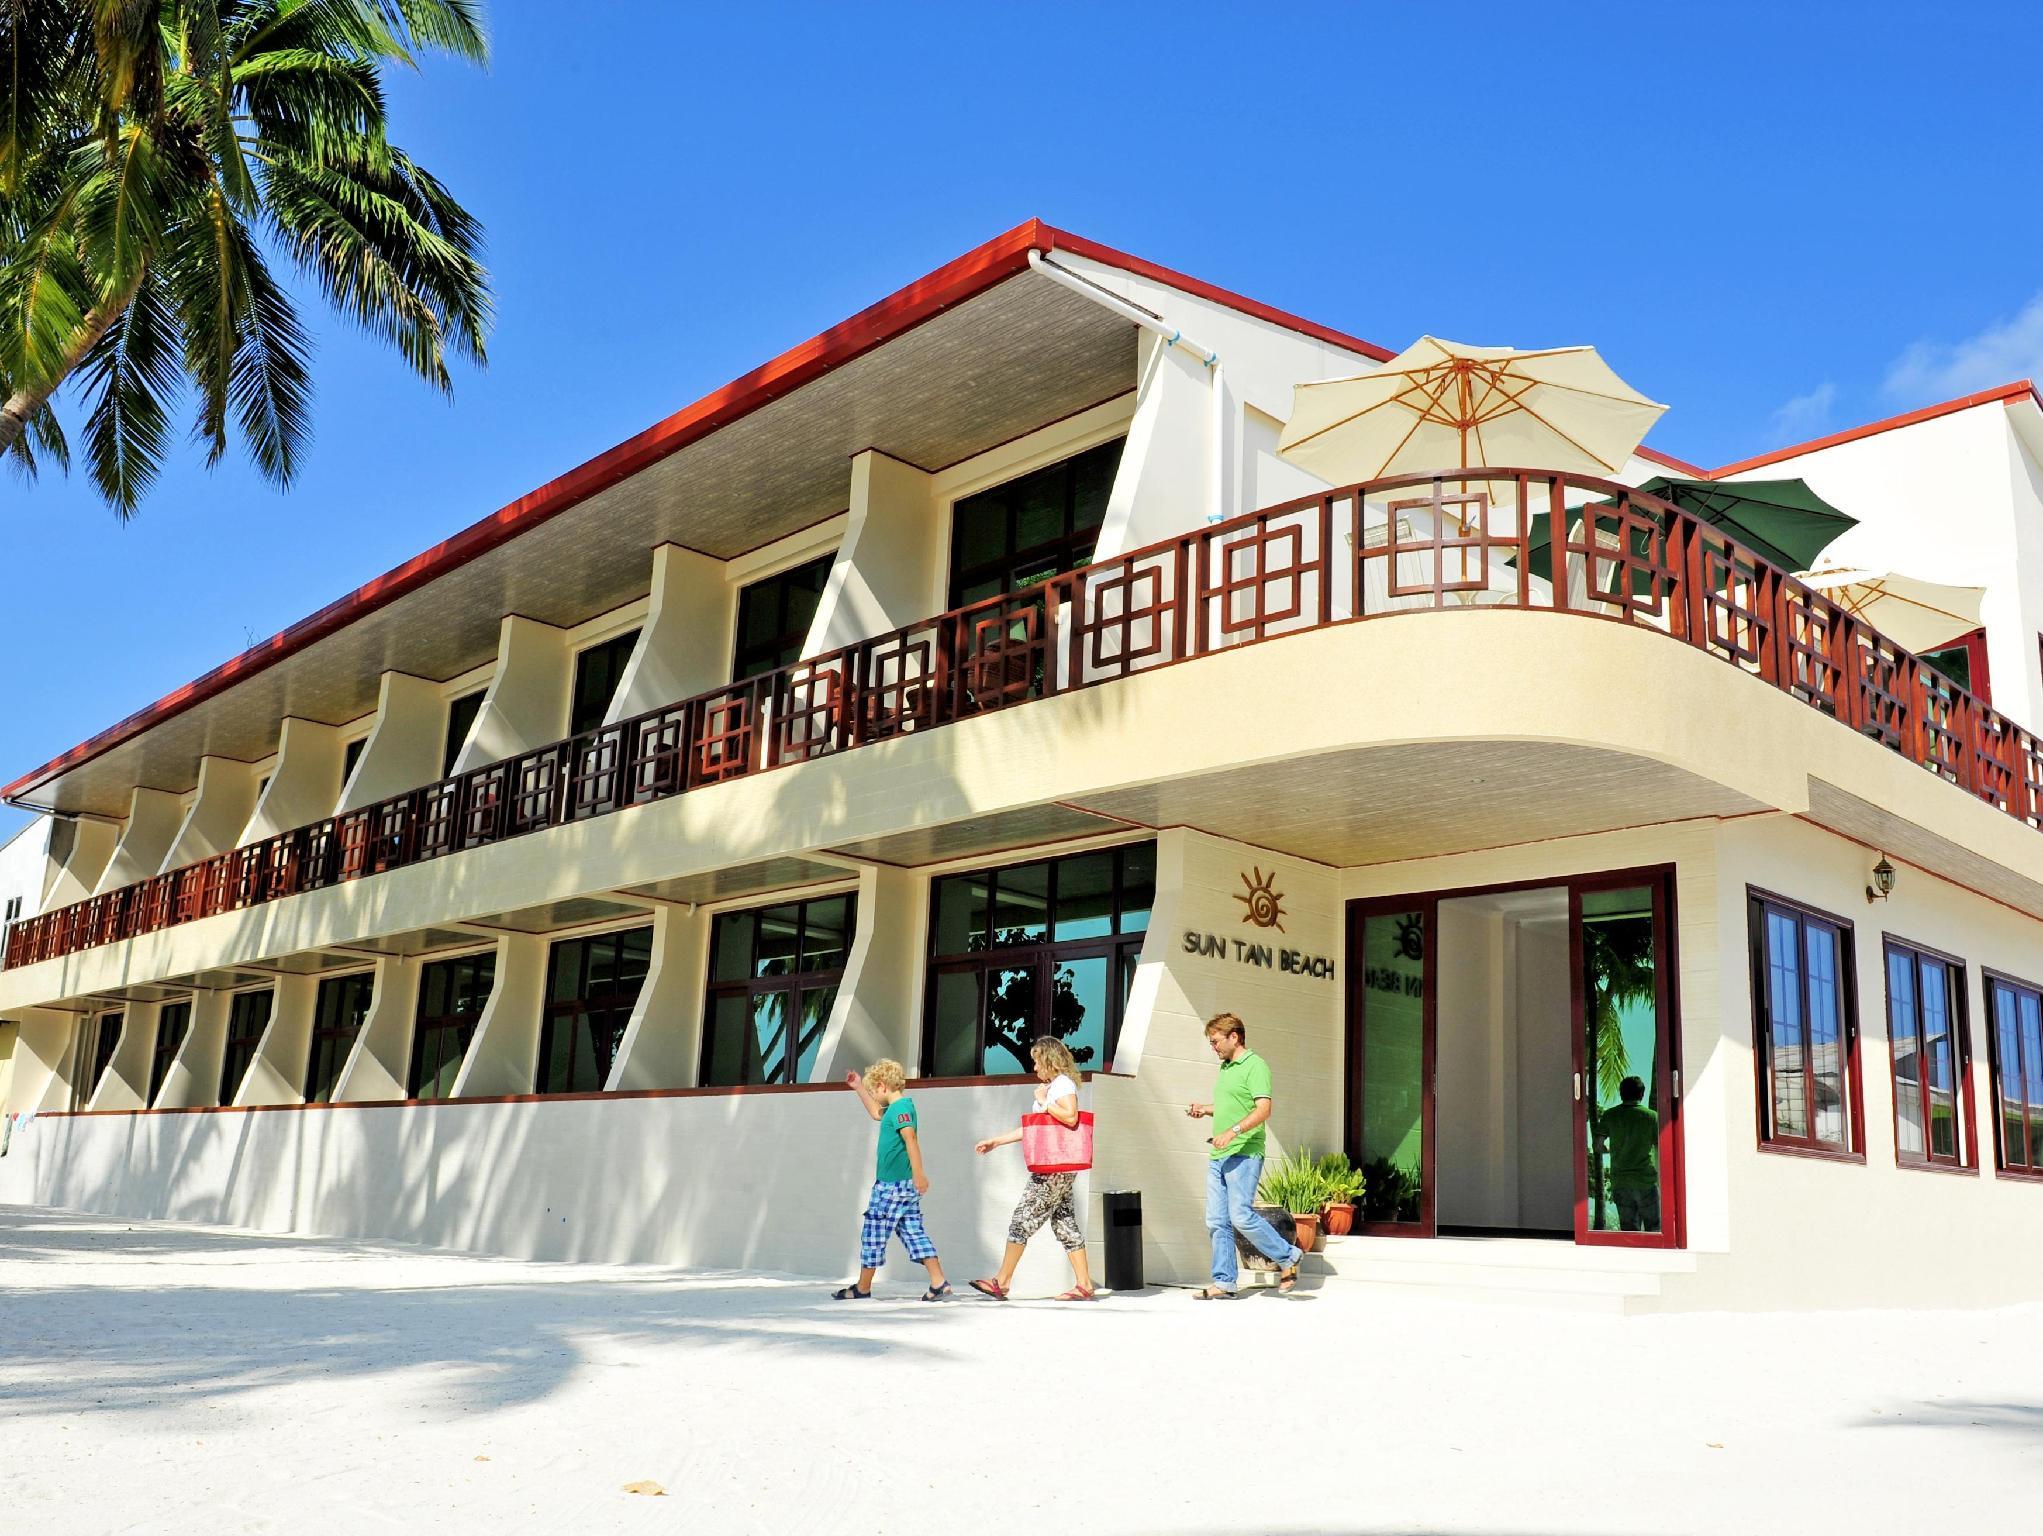 Sun Tan Beach Hotel at Maafushi, Kepulauan Maafushi